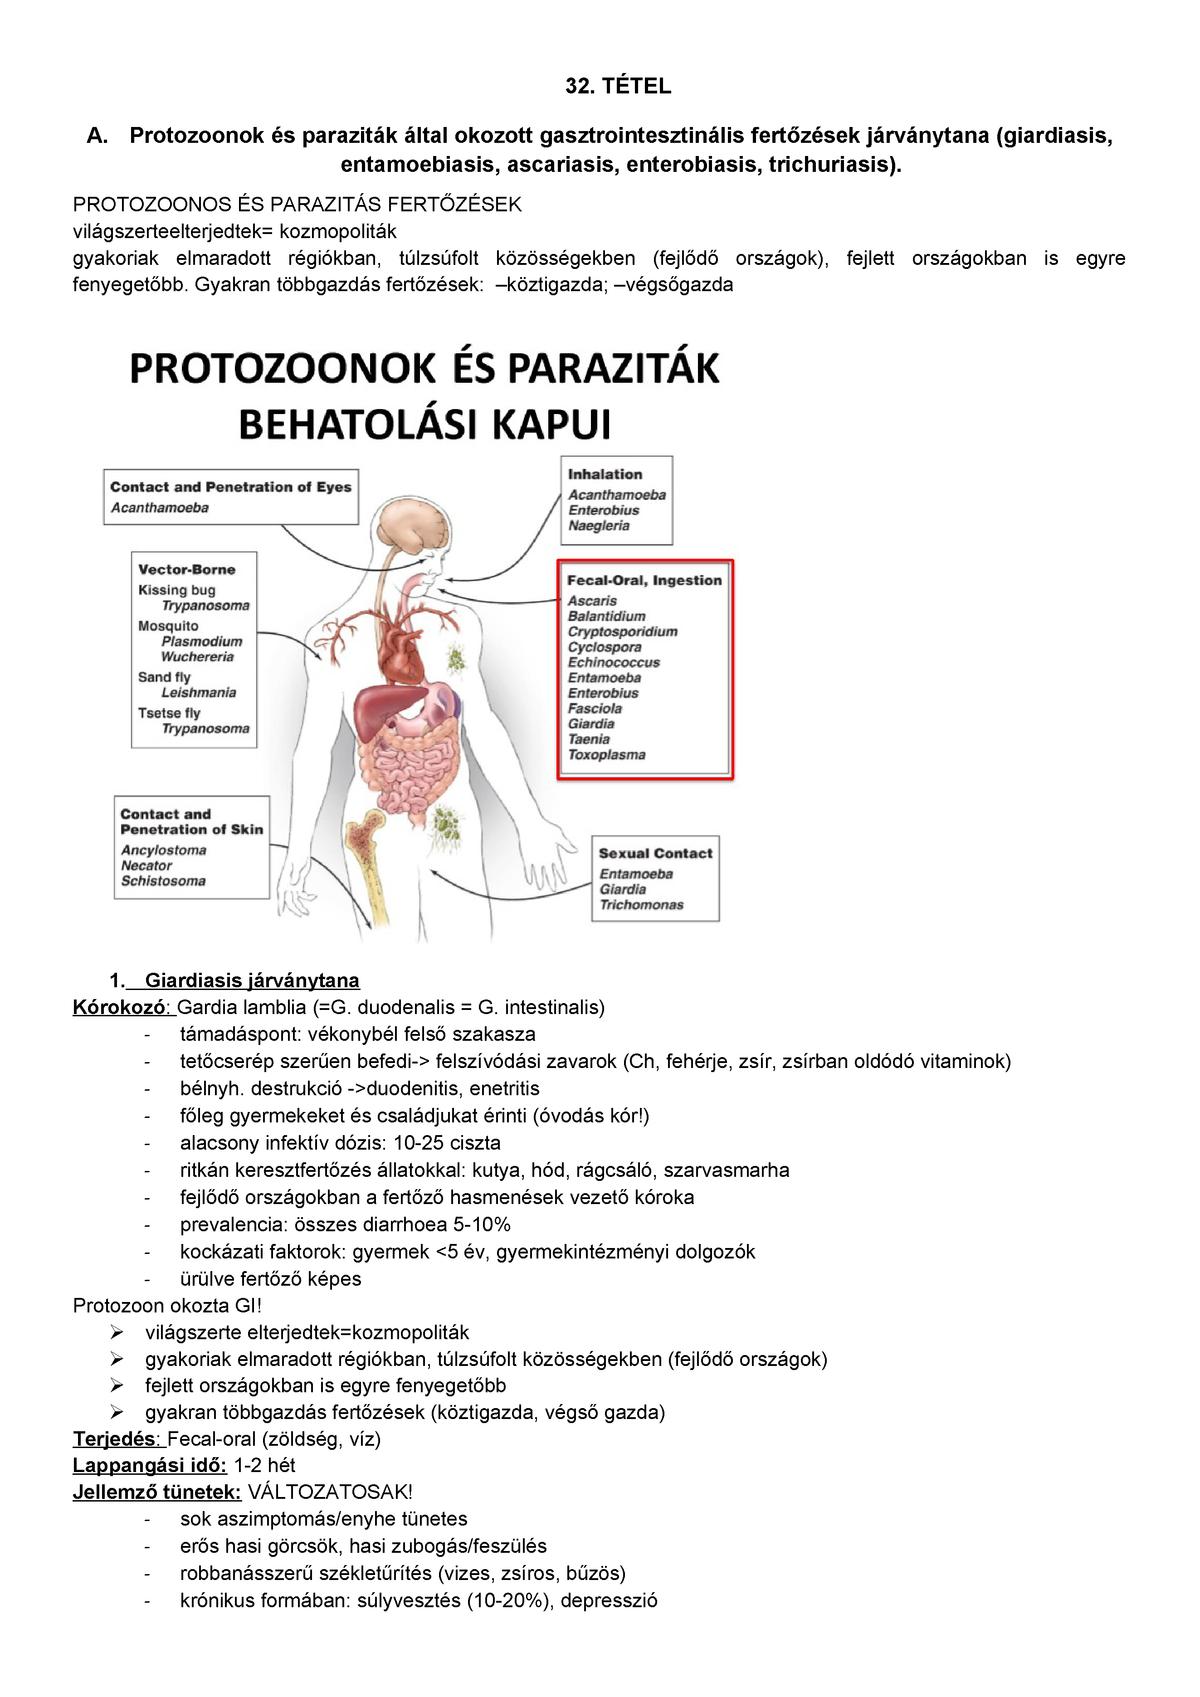 hogyan enged az enterobiosis?